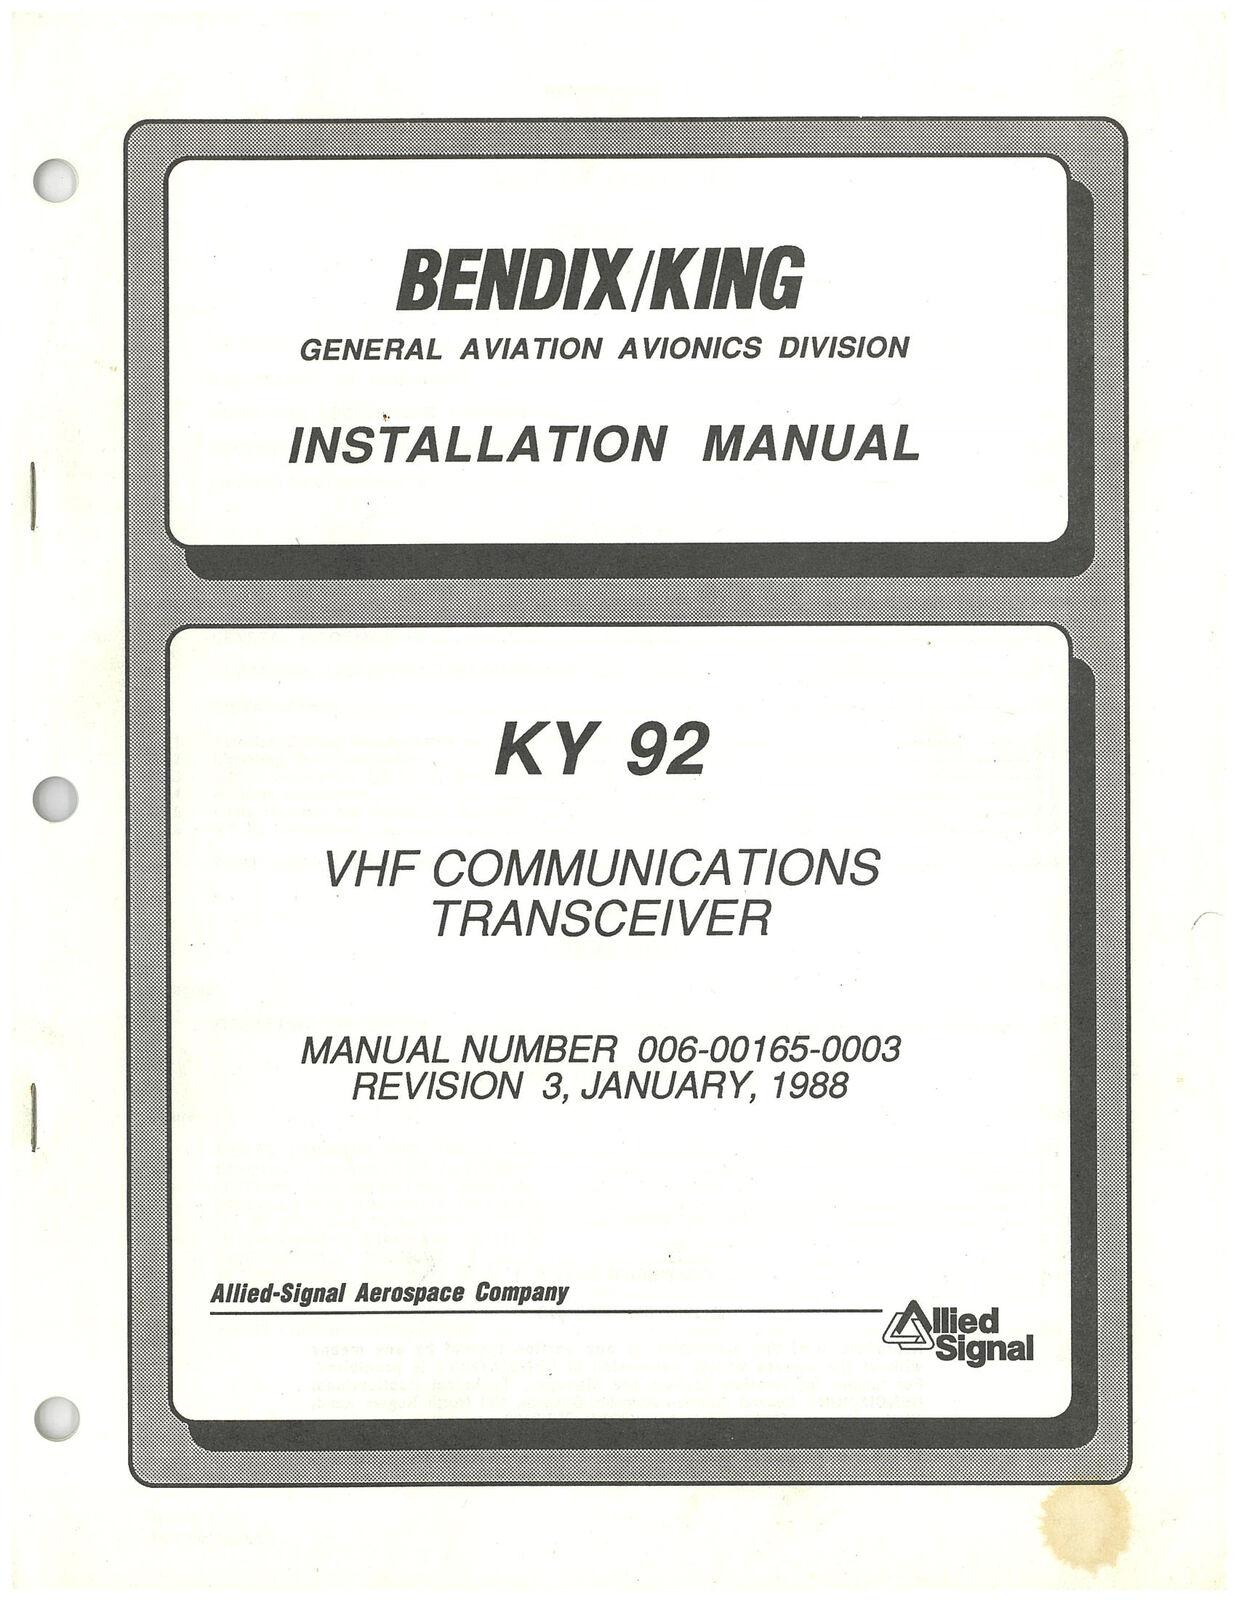 Bendix King KY 92 Installation Manual Rev 3 006-00165-0003